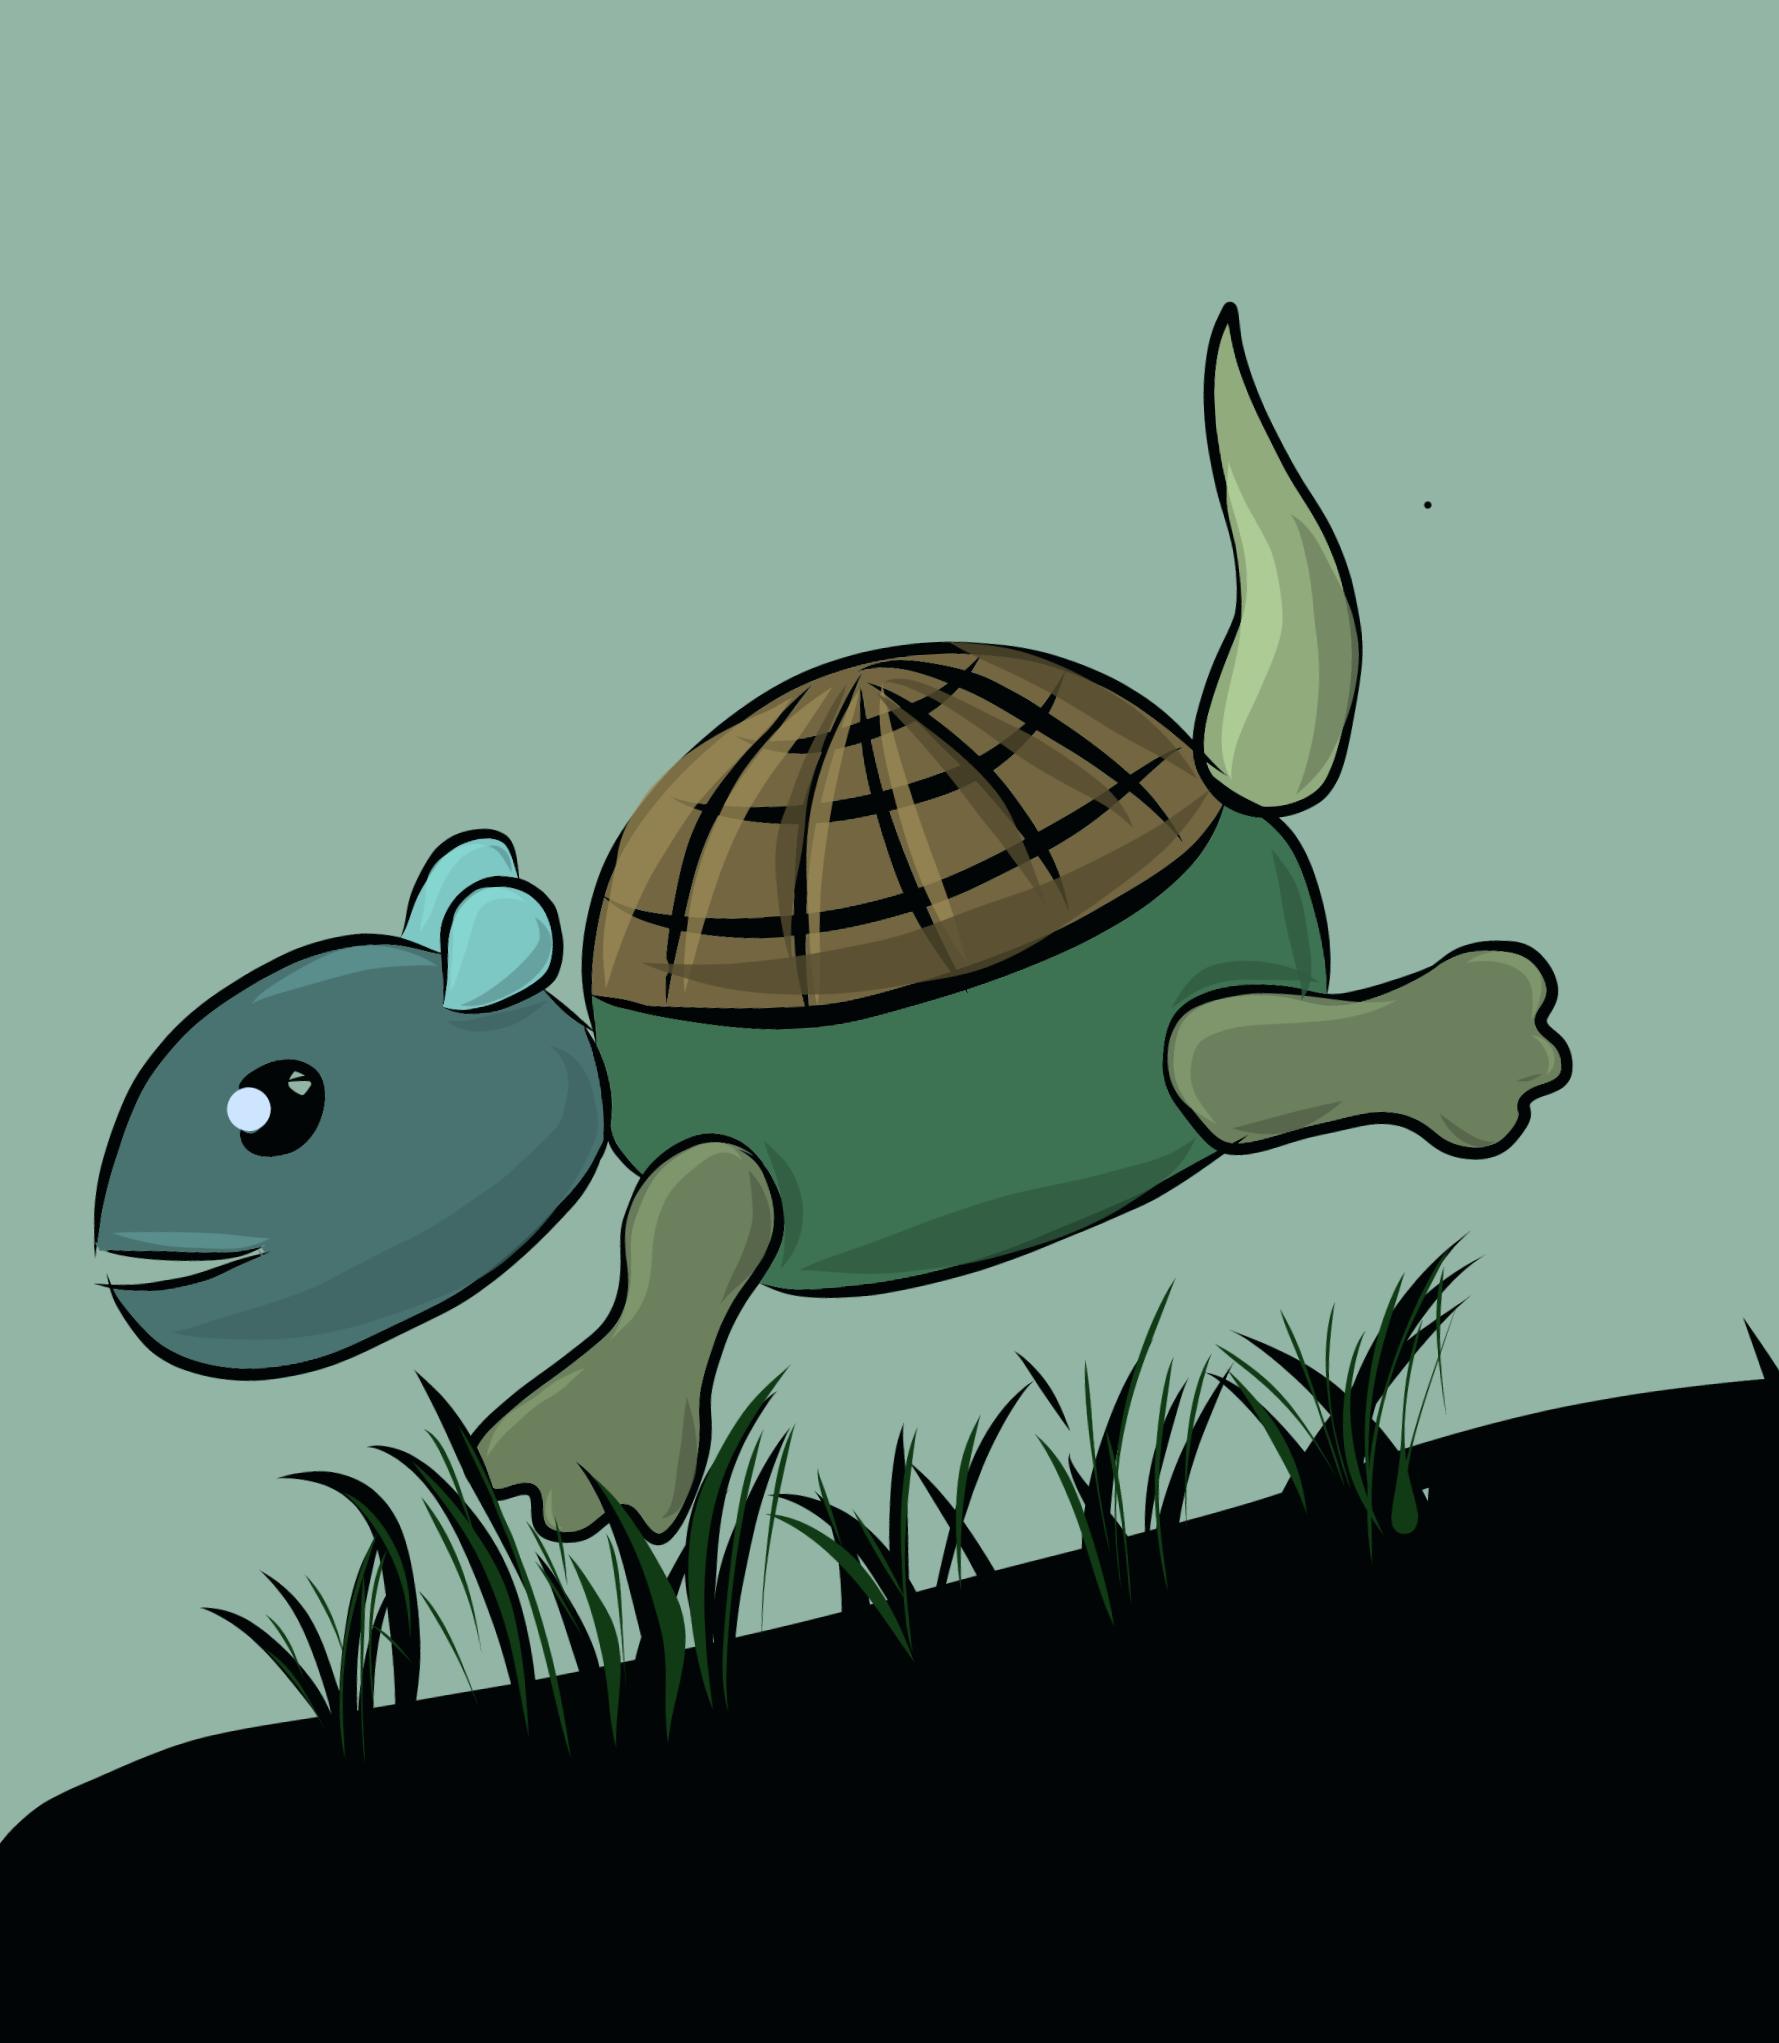 Illustration of a turtle